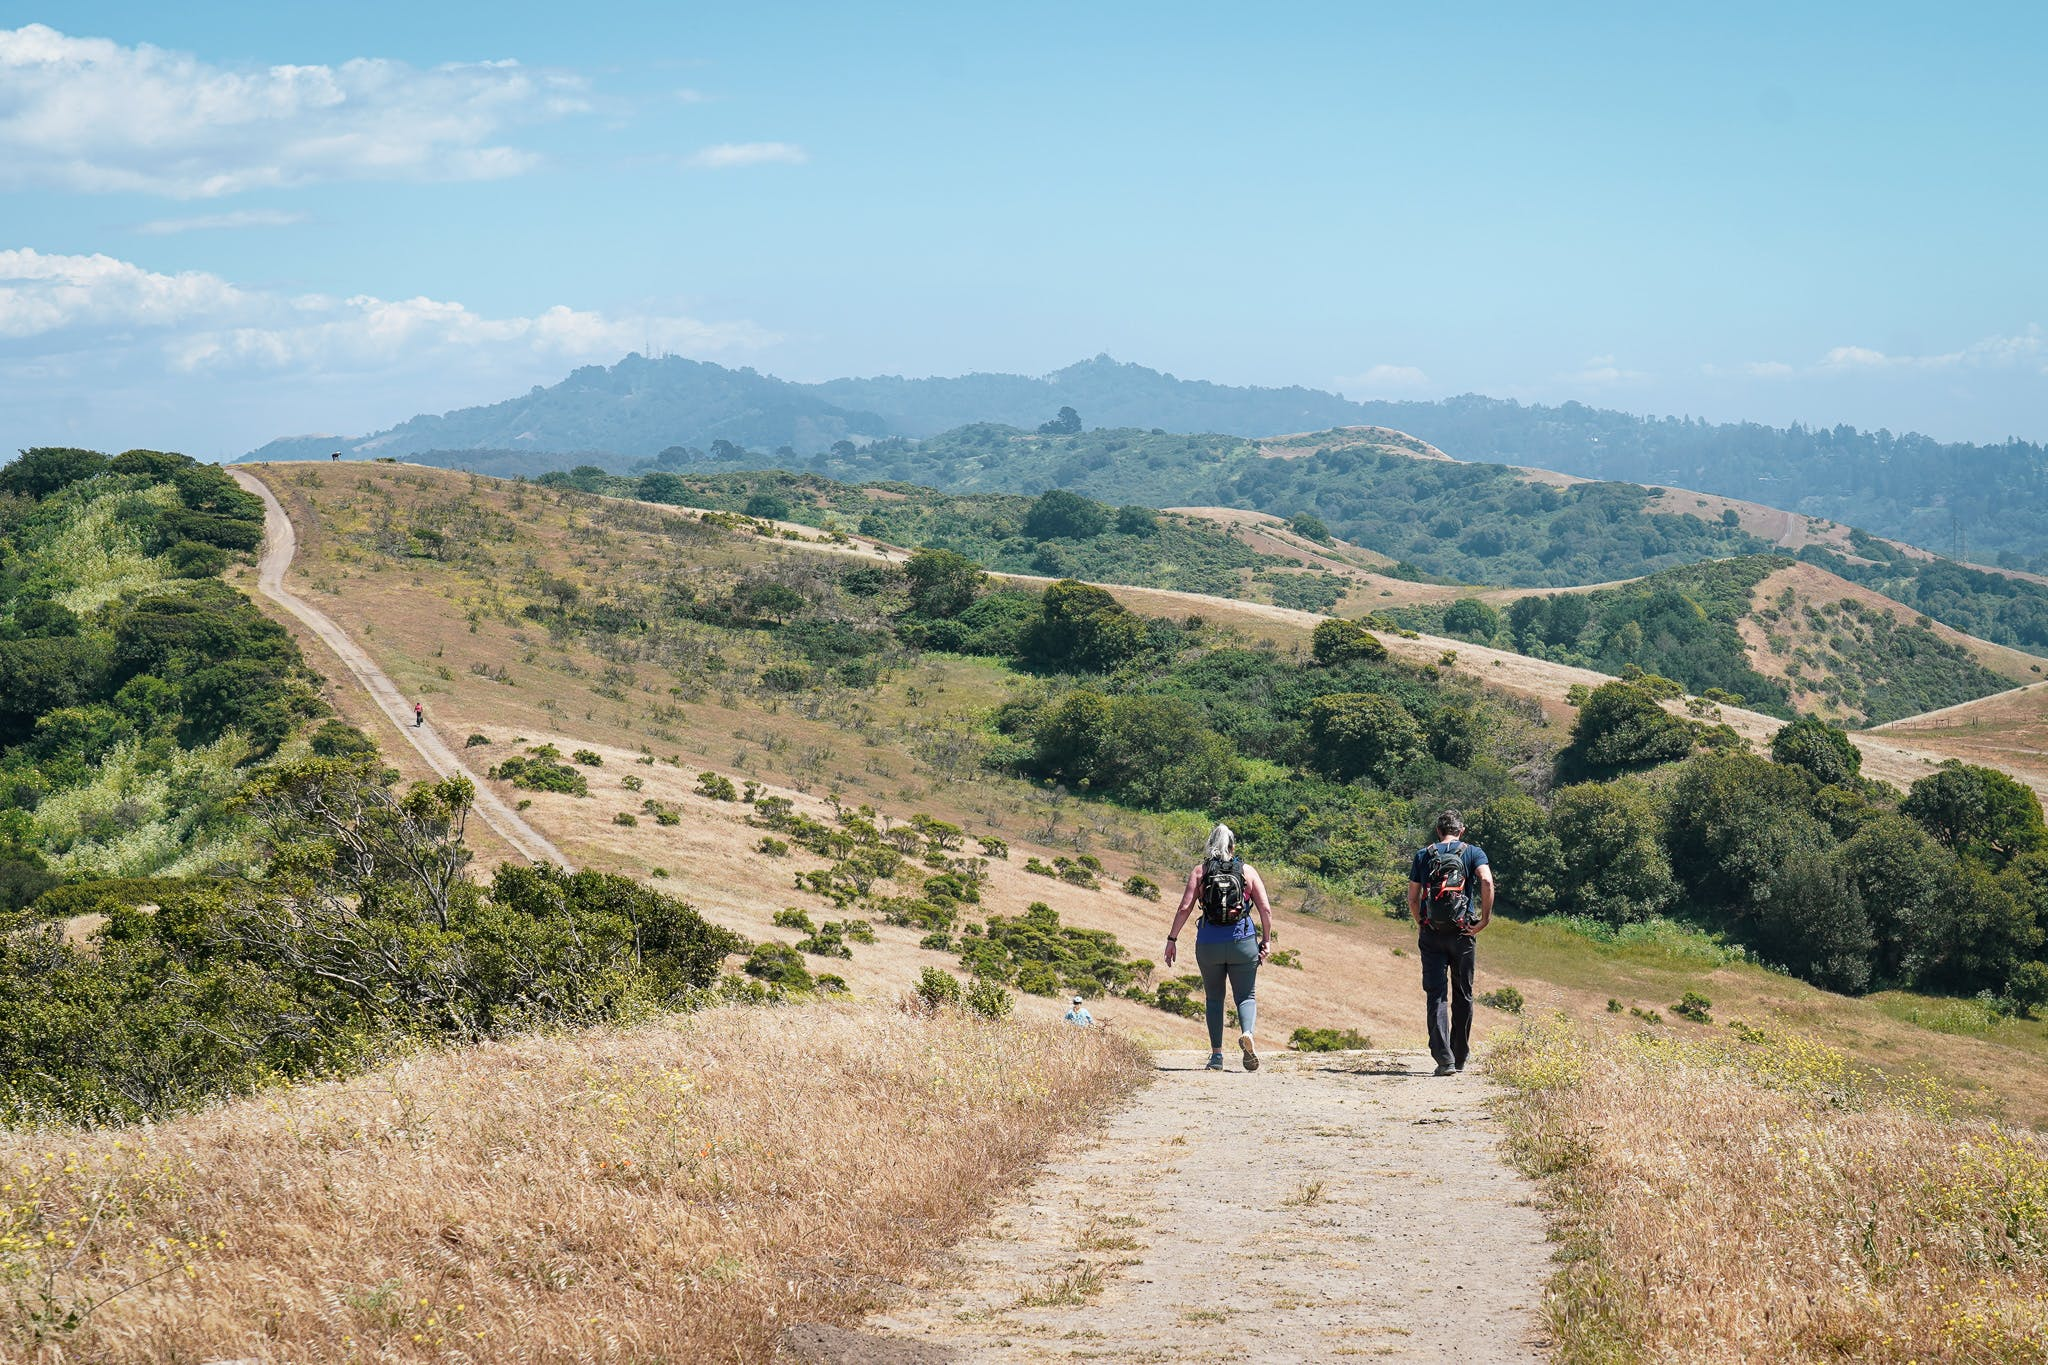 hiking on San Pablo Ridge Trail in Wildcat Canyon